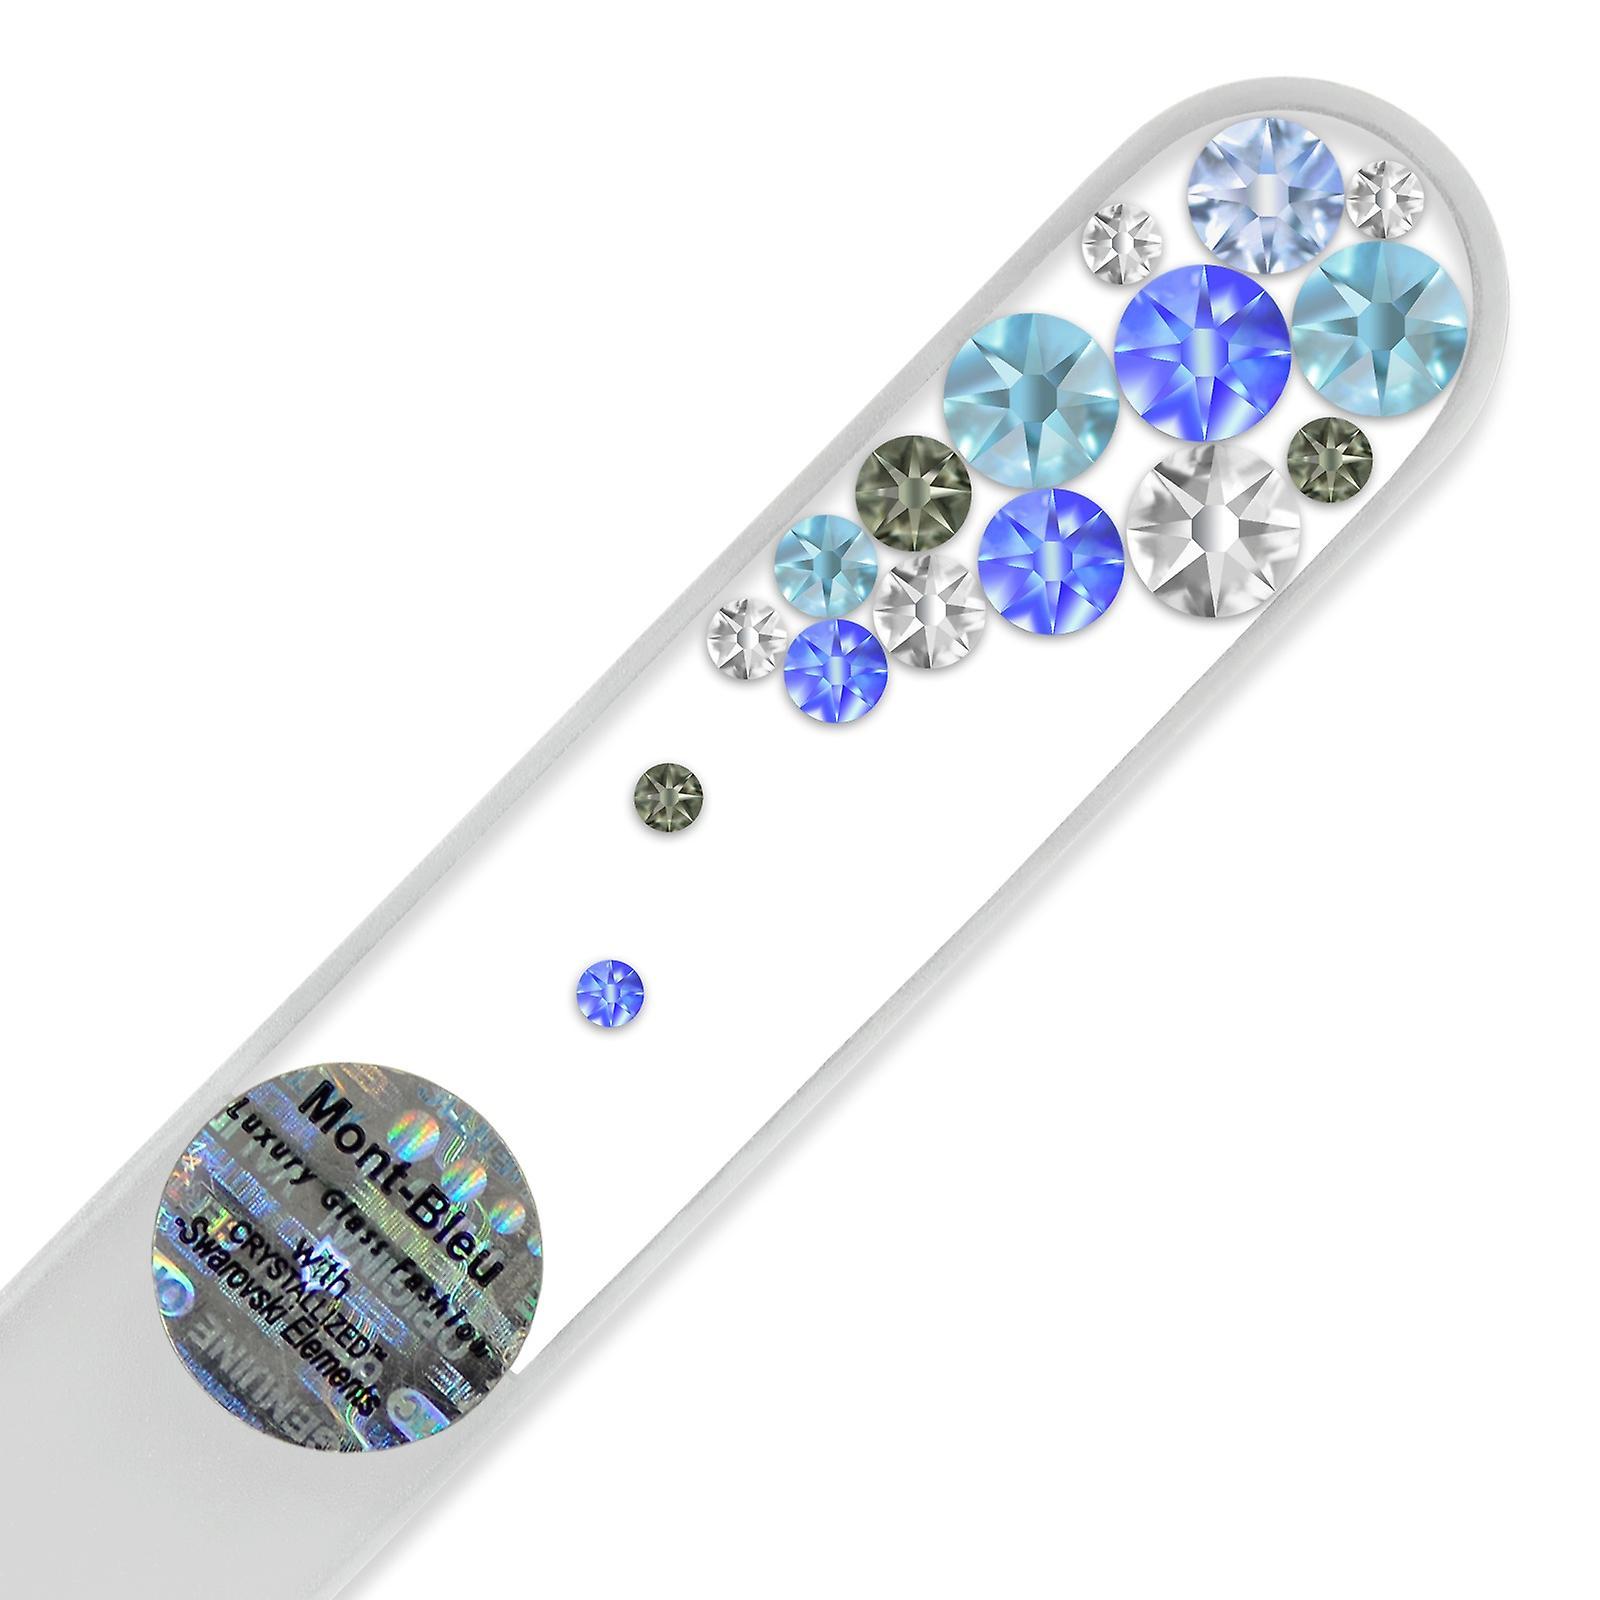 Swarovski krystall neglefil B-M1-12